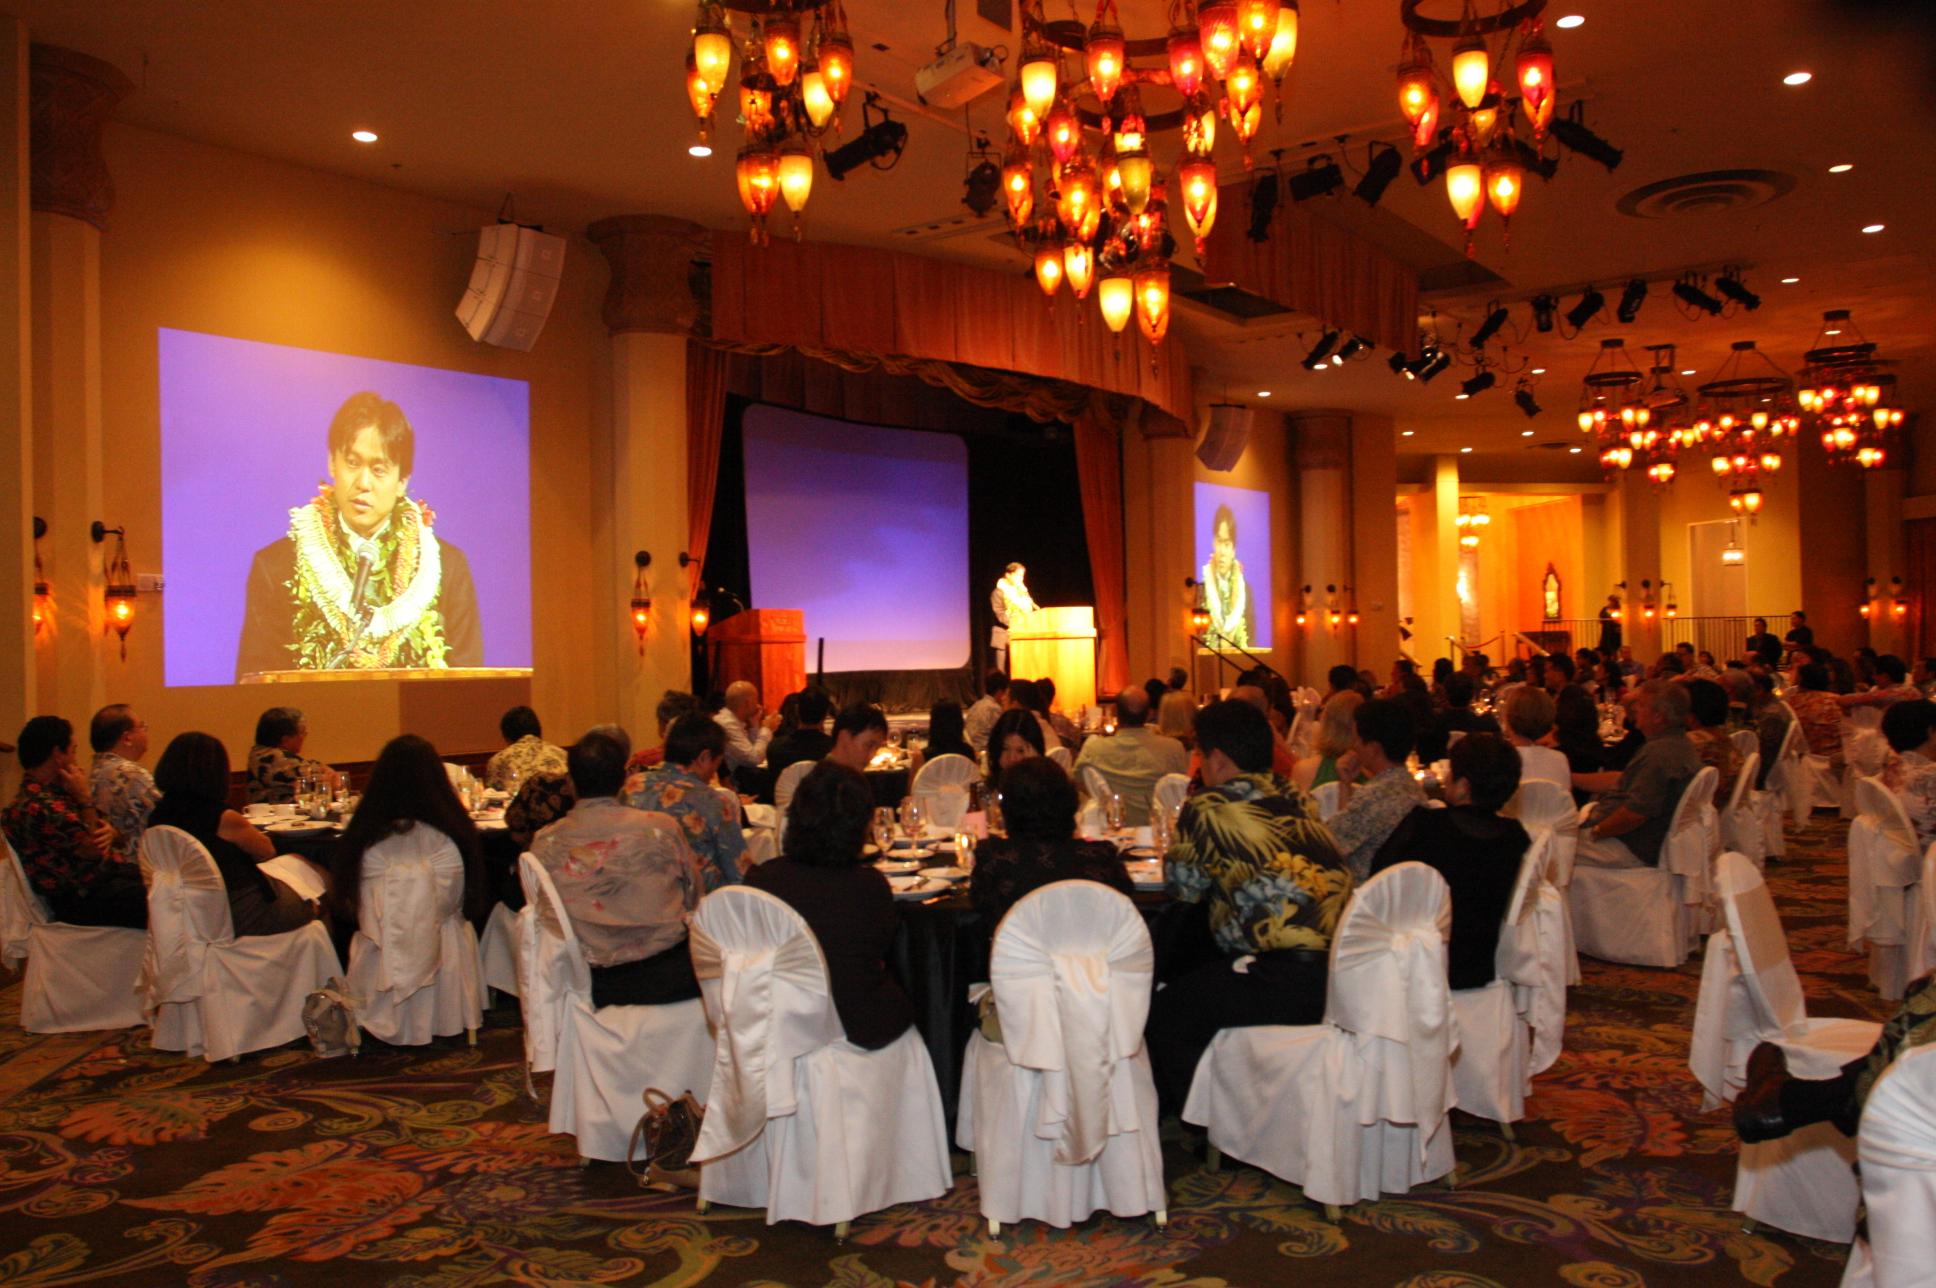 Rep. Jon Riki Karamatsu's speech on his Lt. Governor platform for the State of Hawaii.